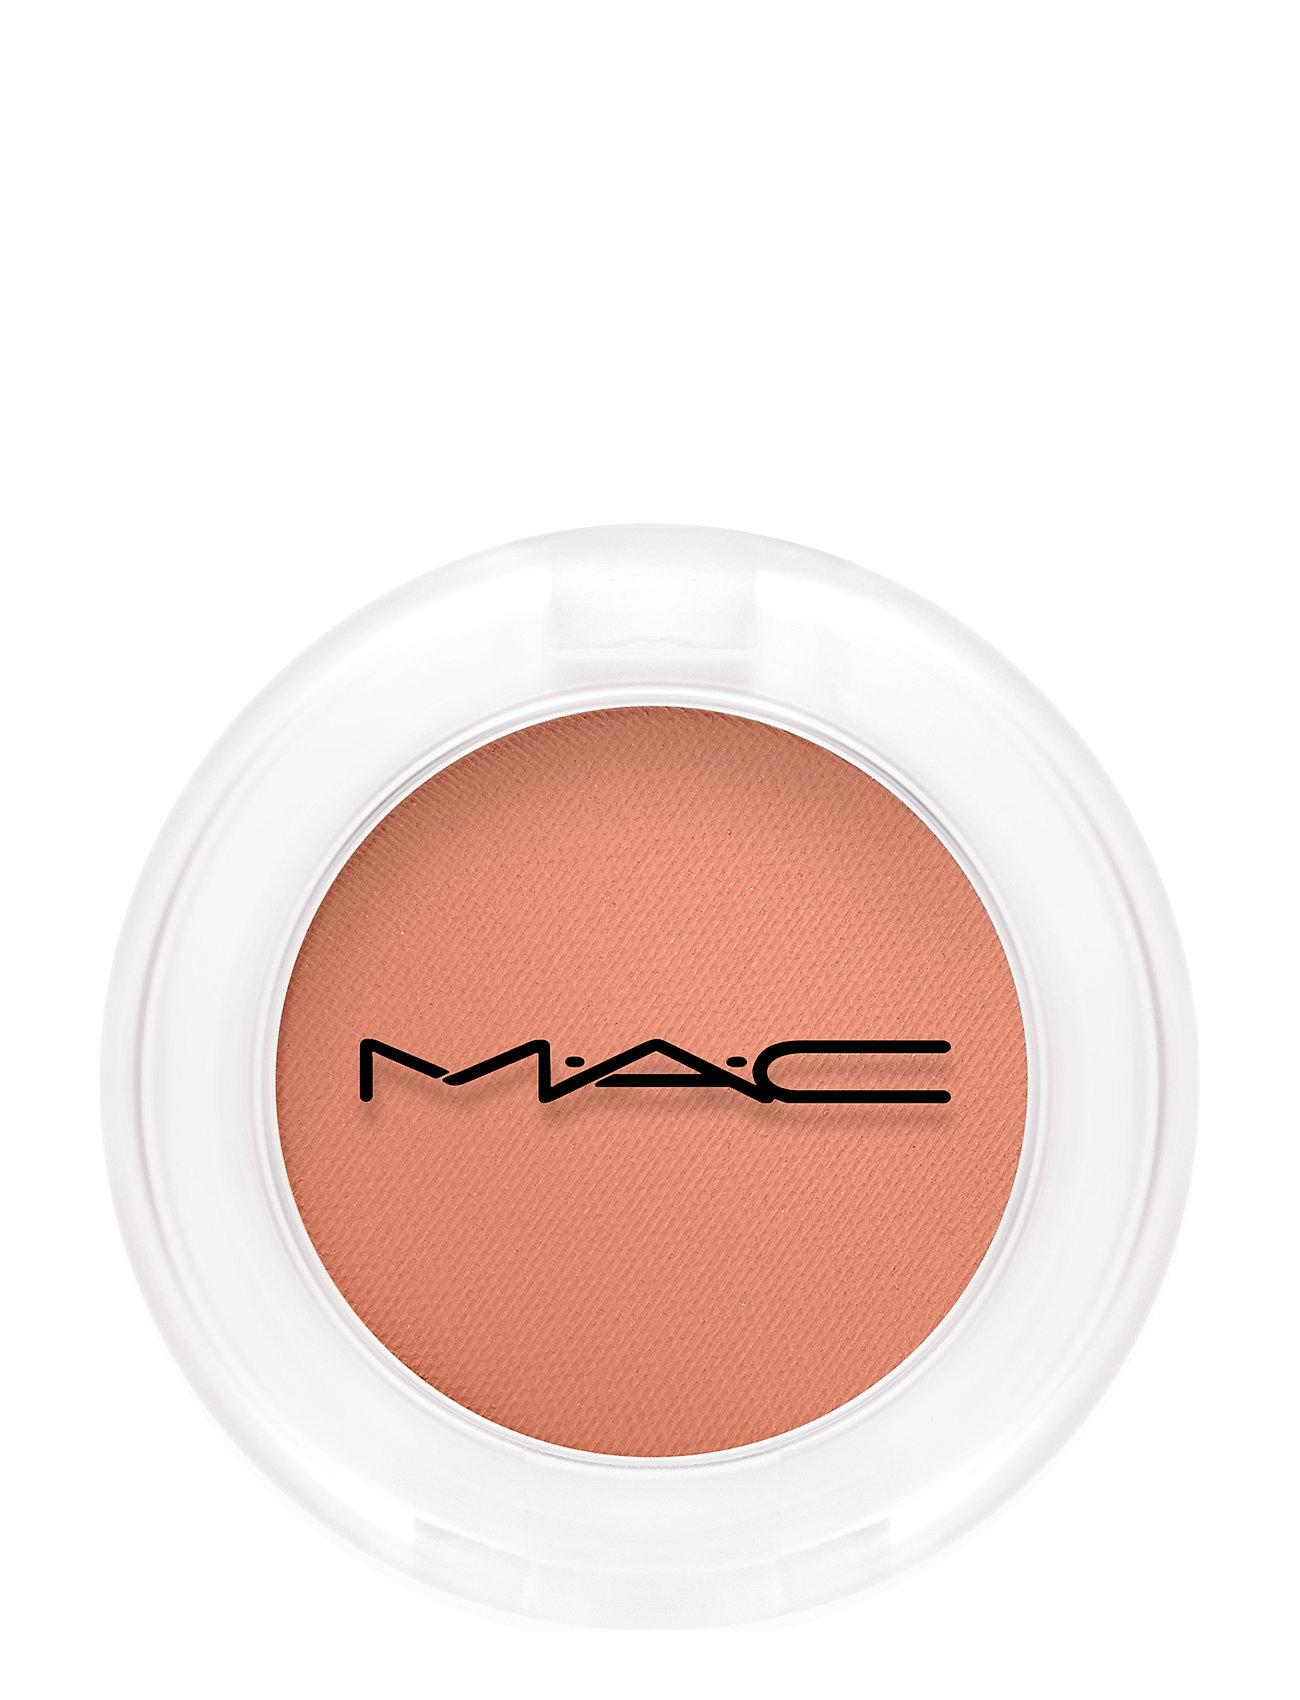 Image of Eye Shadow Beauty WOMEN Makeup Eyes Eyeshadow - Not Palettes Beige M.A.C. (3349215073)